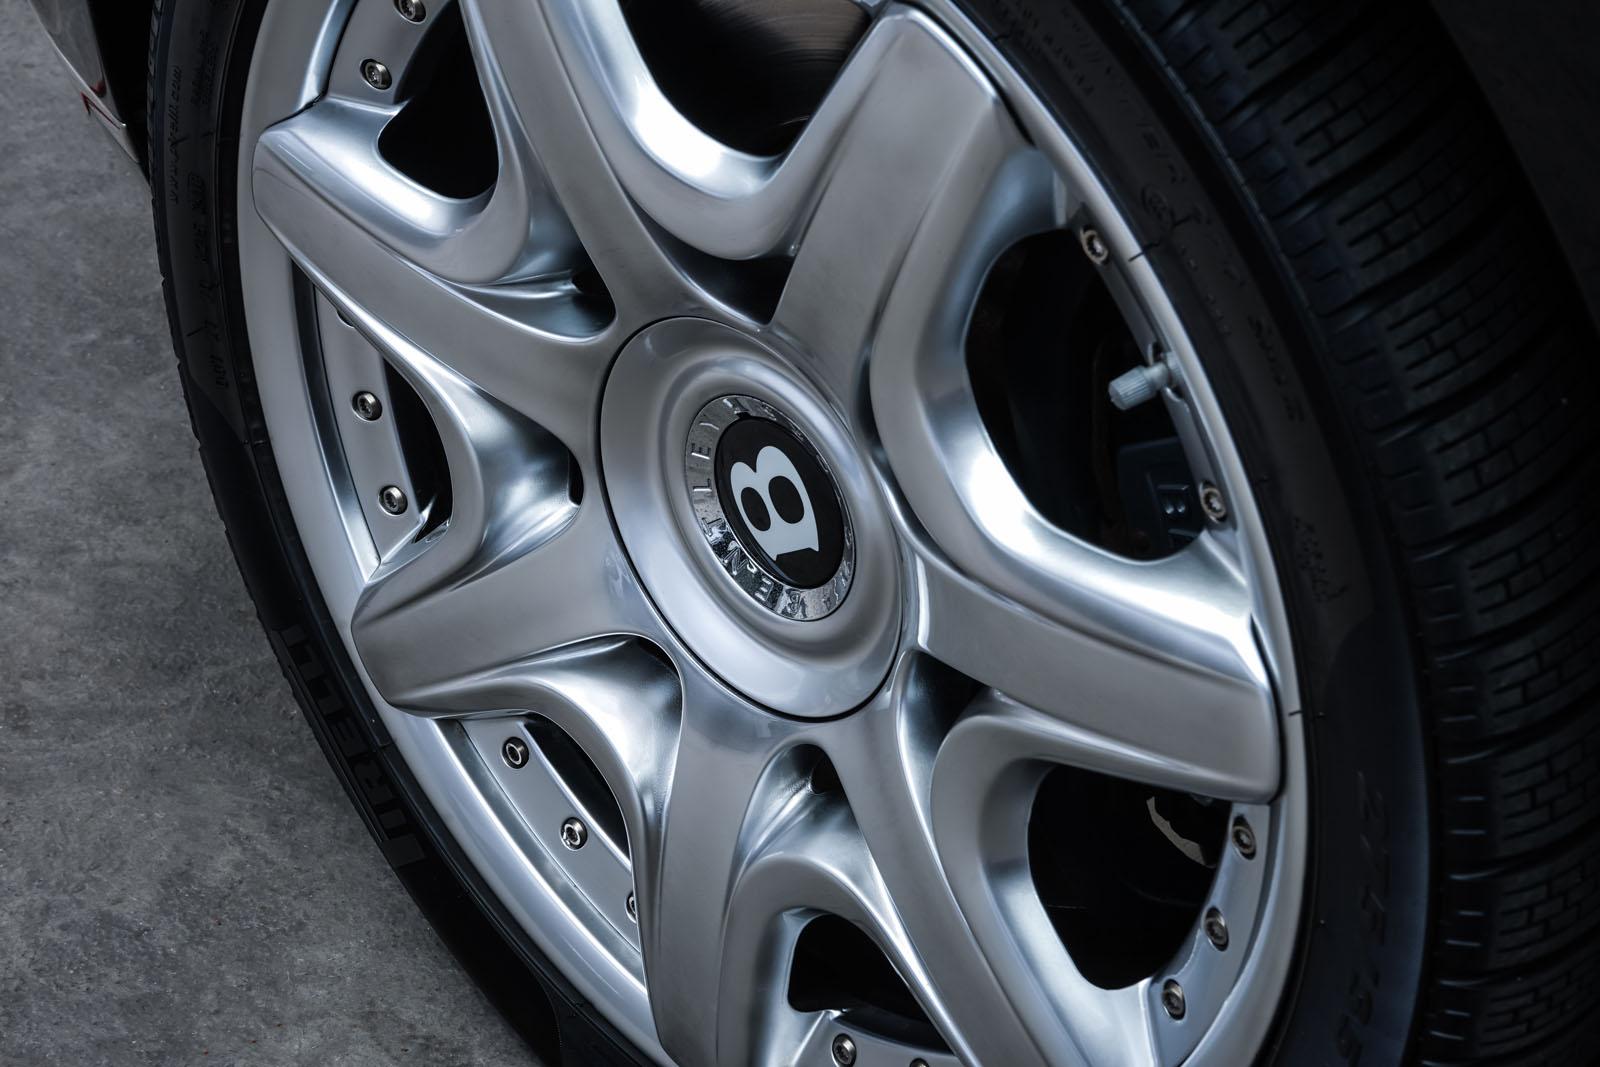 Bentley_Continental_GT_Schwarz_Beige_BEN-1159_10_w